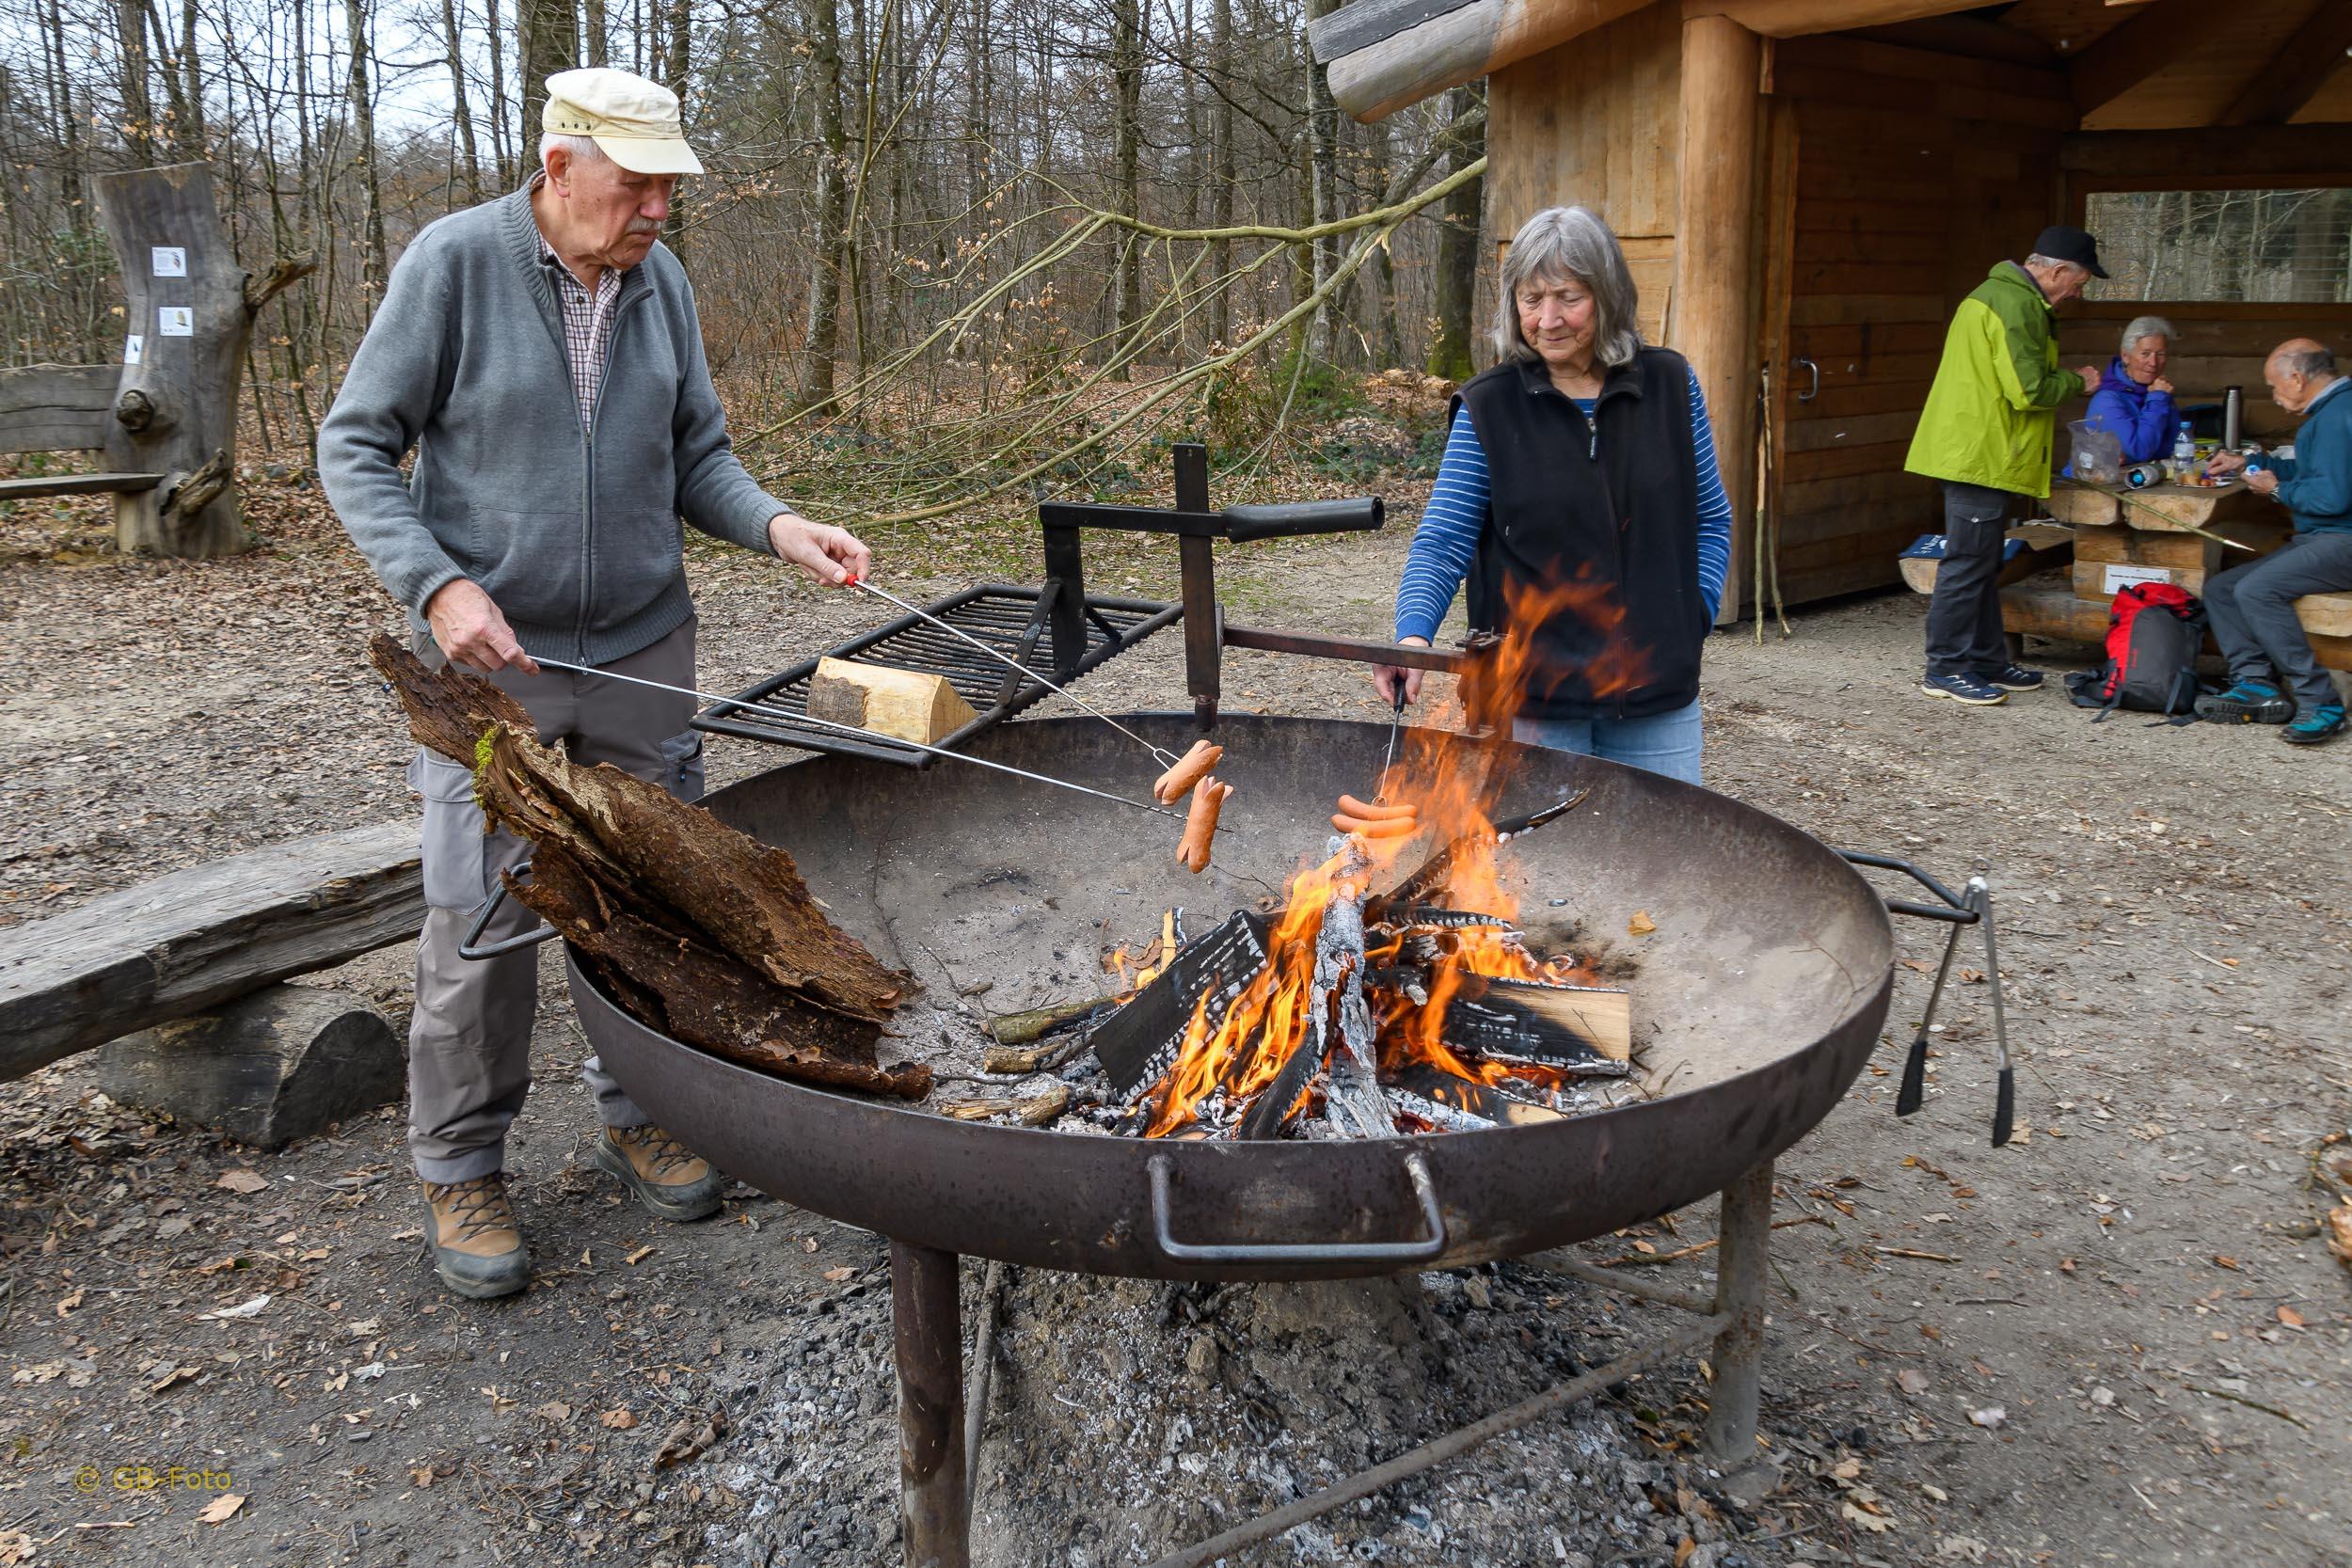 Seniorenwanderung Kaiseraugst - Rheinfelden 04.03.2021